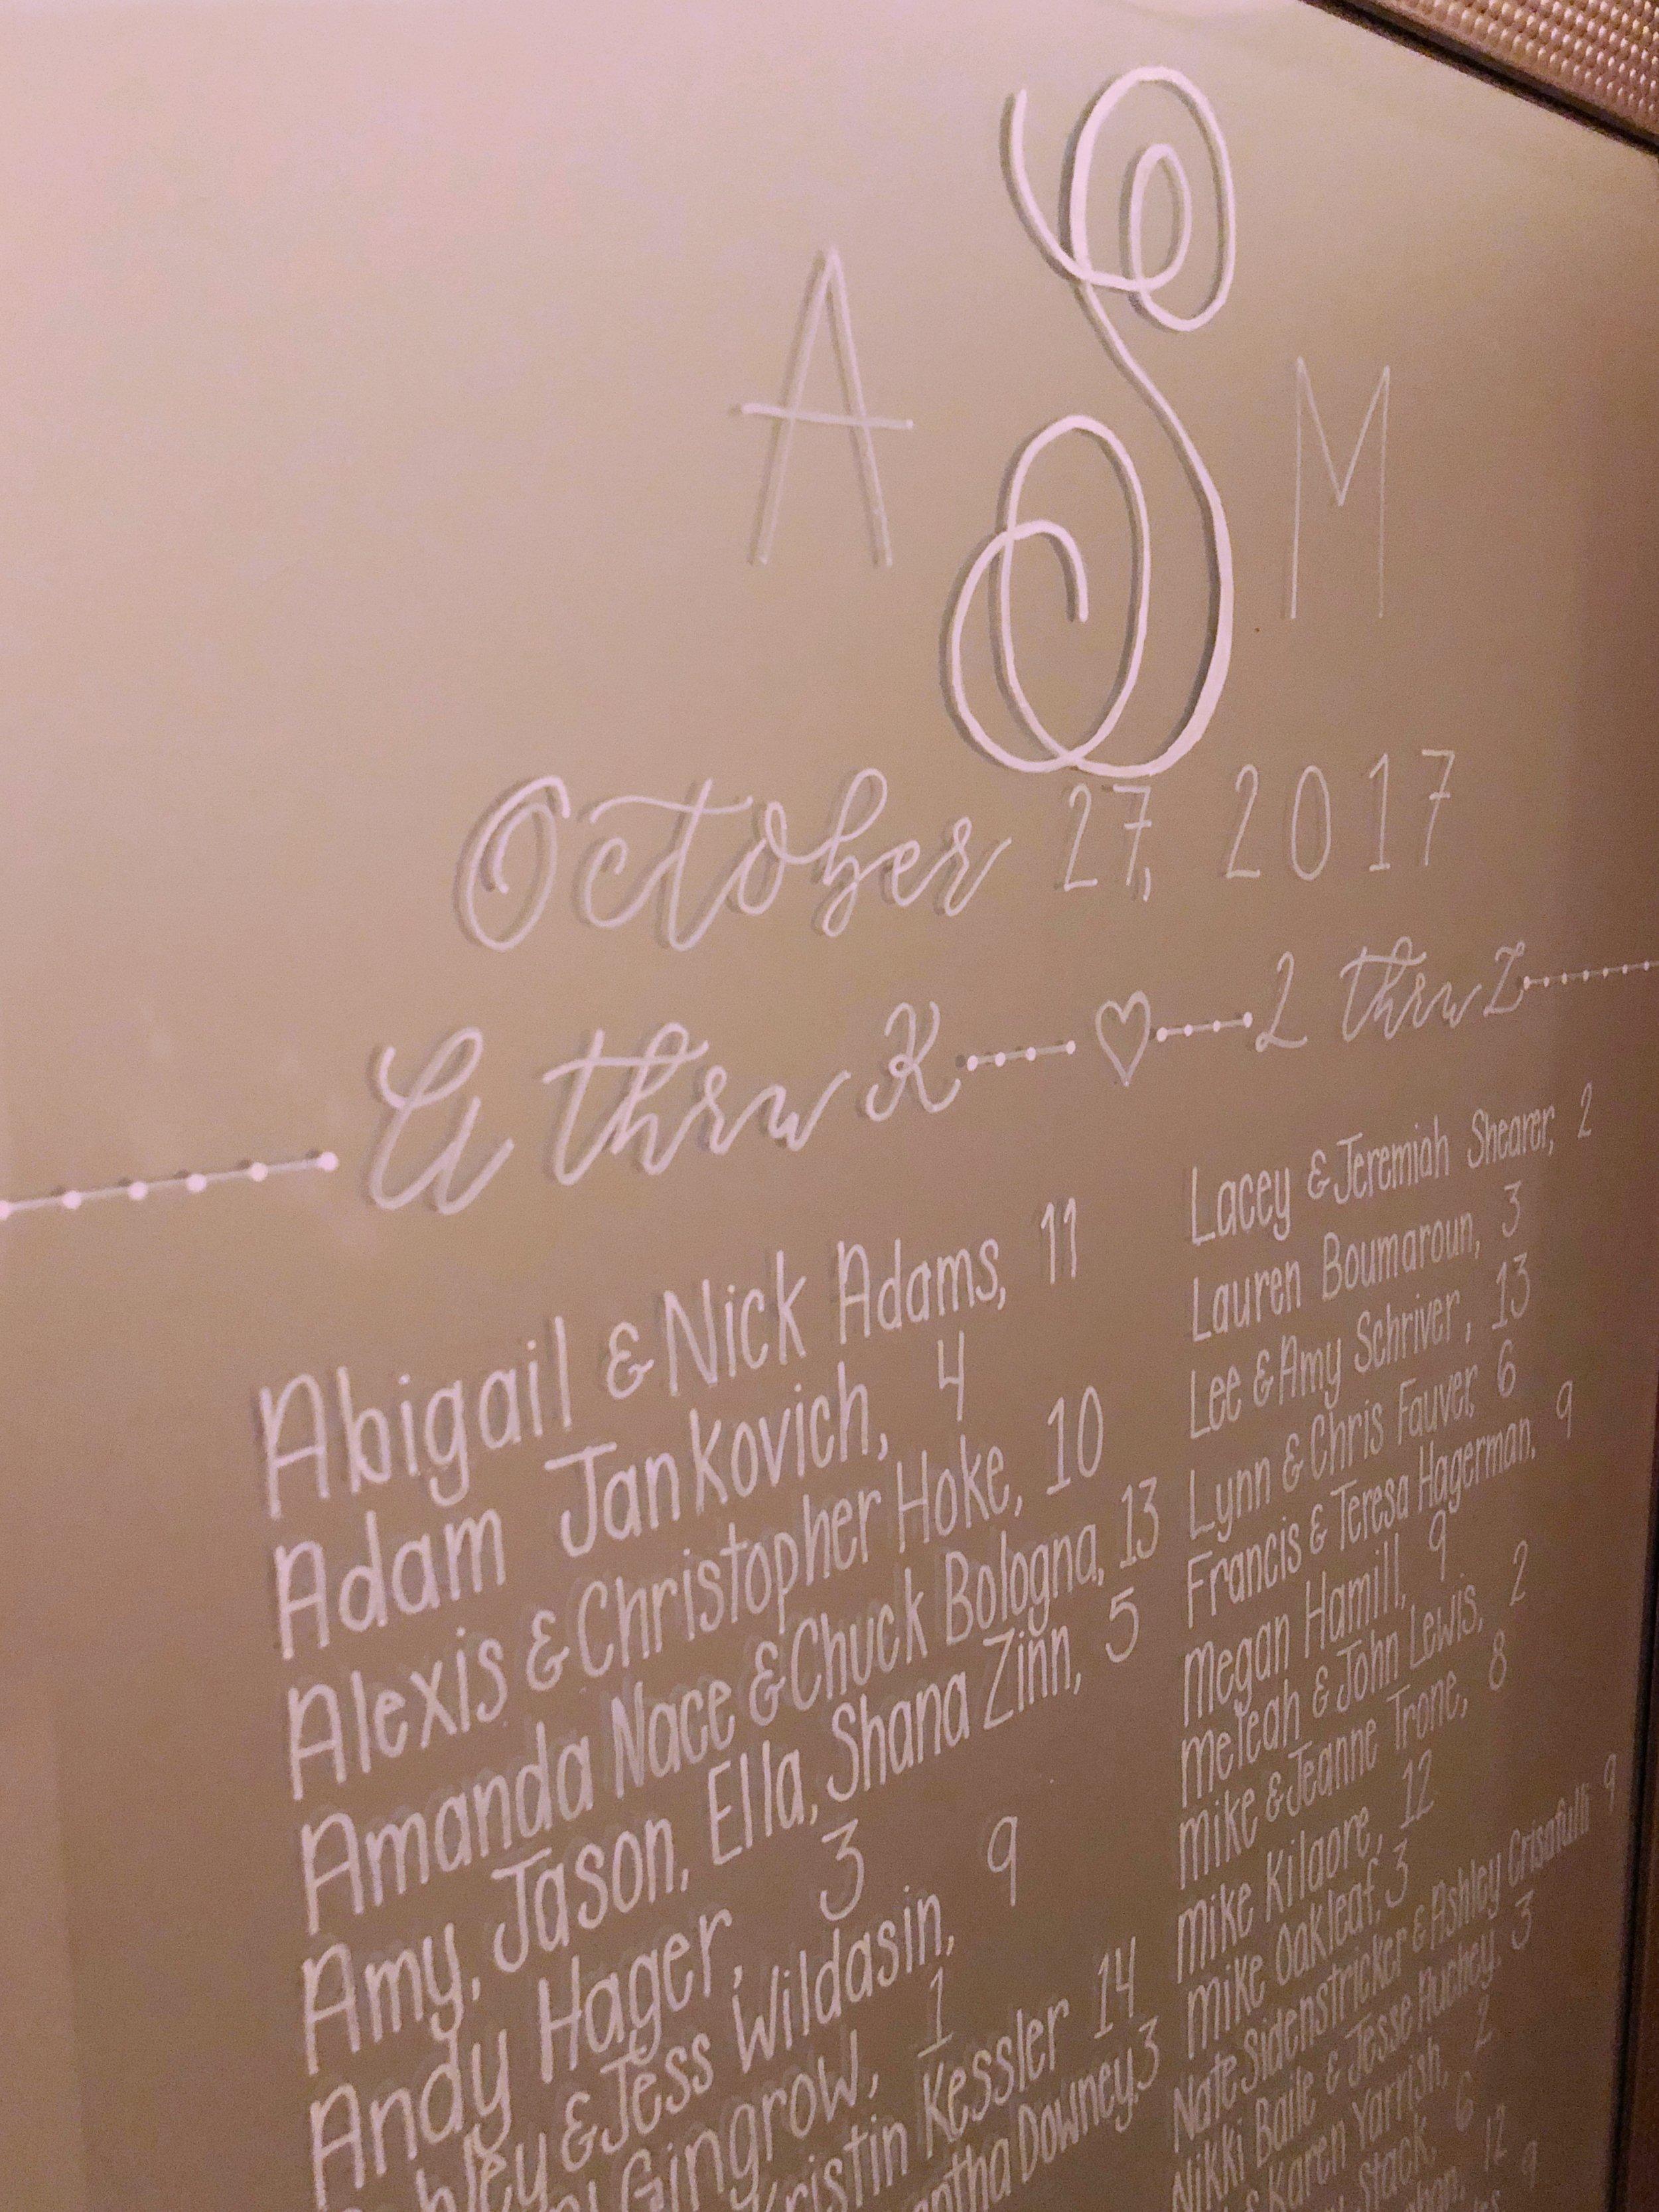 Central PA, York PA, JesSmith Designs, custom, wedding, invitations, bridal, announcements, save the date, birth, baby, motherhood, hanover, calligraphy, handlettering, wedding invitations, lancaster, gettysburg-10-23 22.17.46.jpg